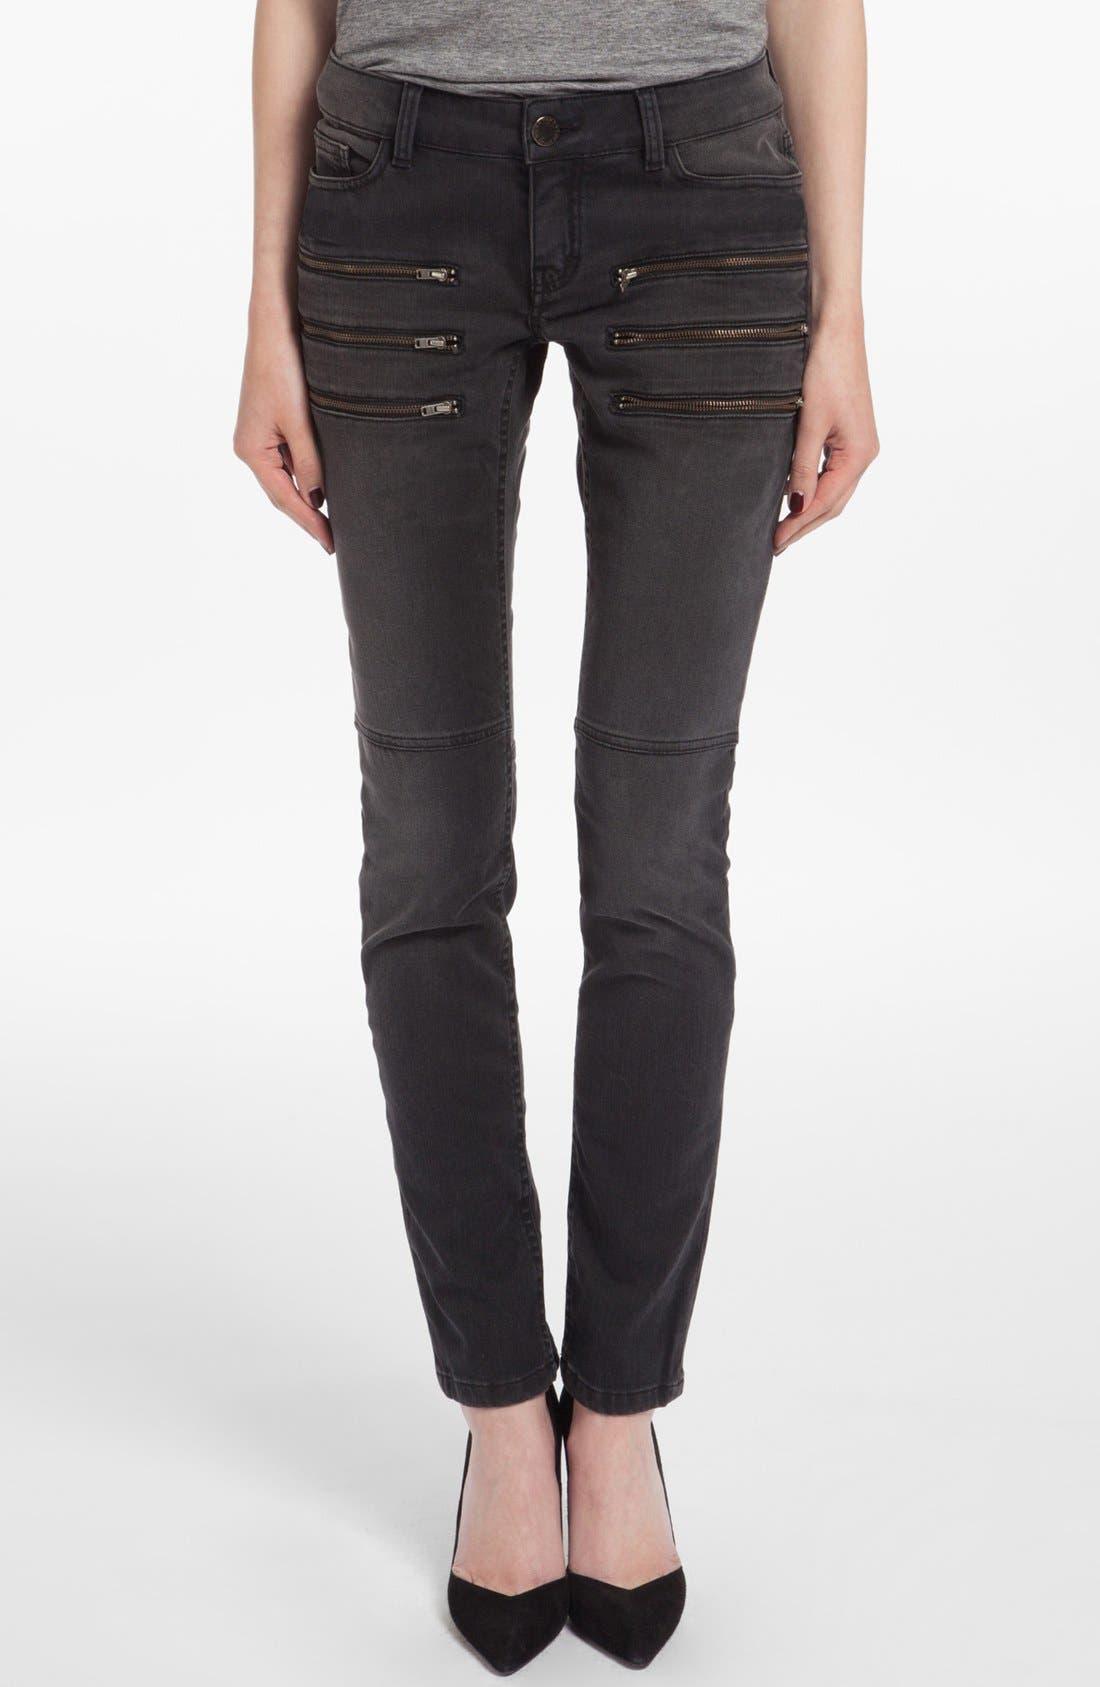 Main Image - maje 'Dip' Colored Skinny Jeans (Noir)